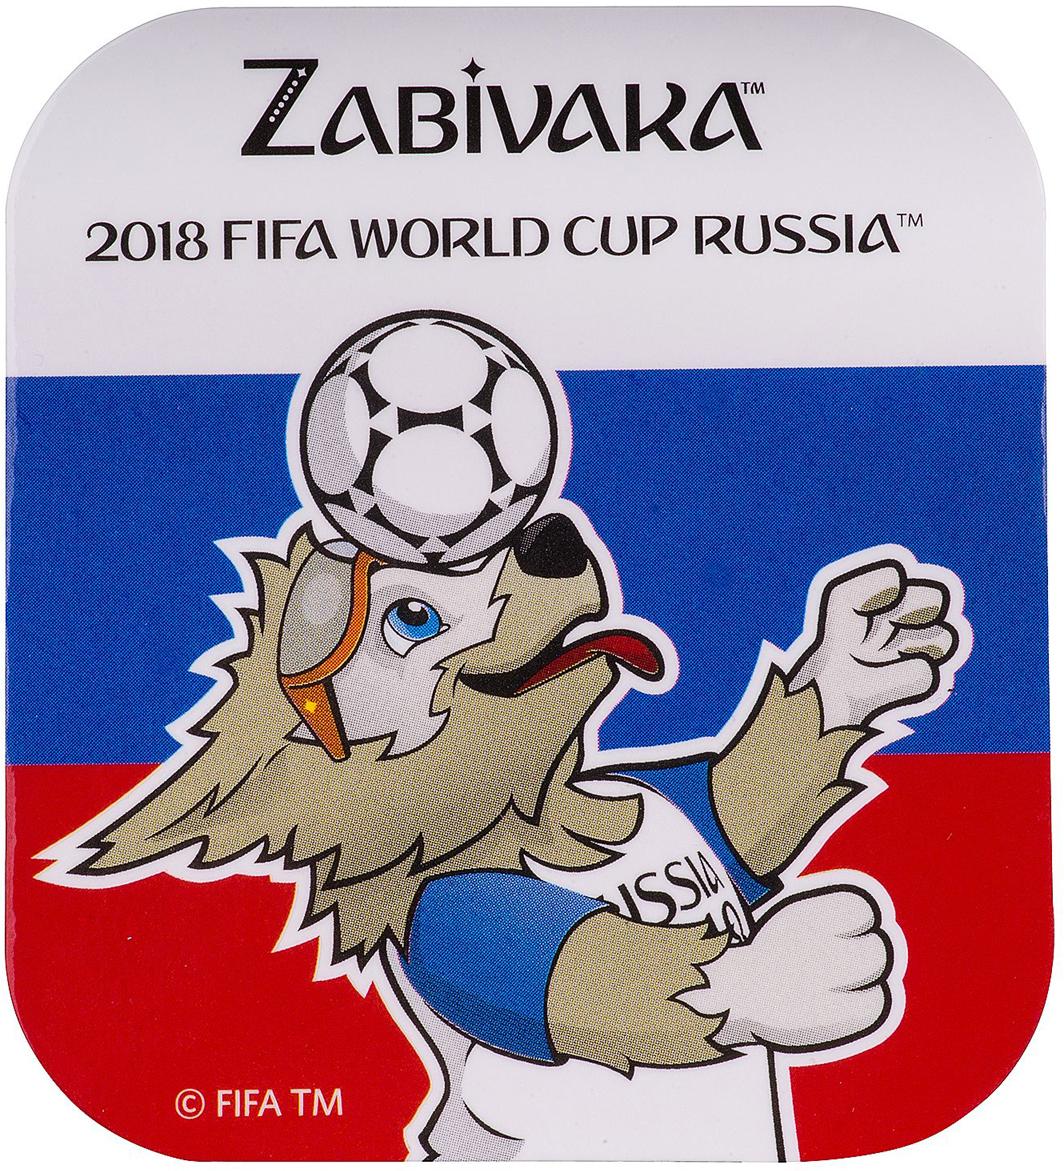 Магнит сувенирный FIFA 2018 Забивака Улыбайся!, 8 х 11 см. СН531 сувенир миленд магнит бодрого утра винил пакетик с европодвесом т 3252